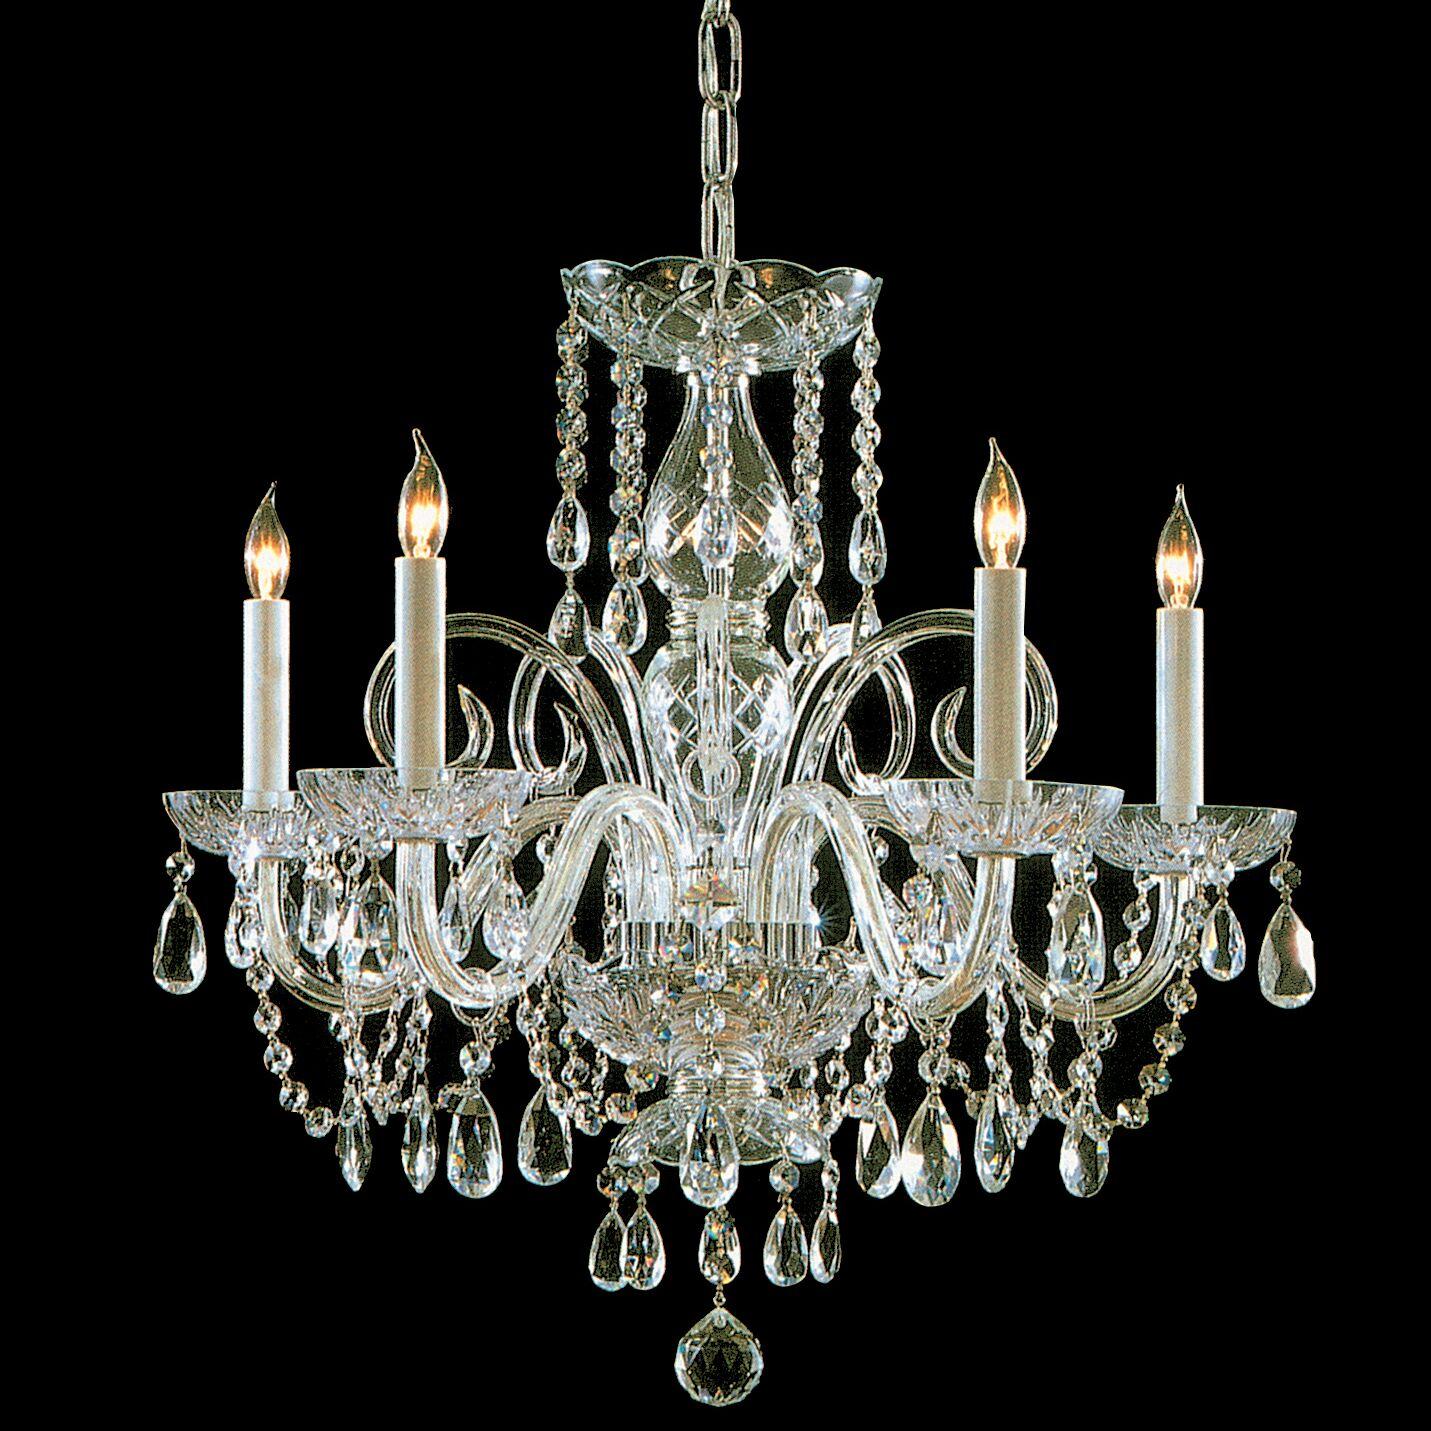 Caledonian 5-Light Candle Style Chandelier Finish: Polished Brass